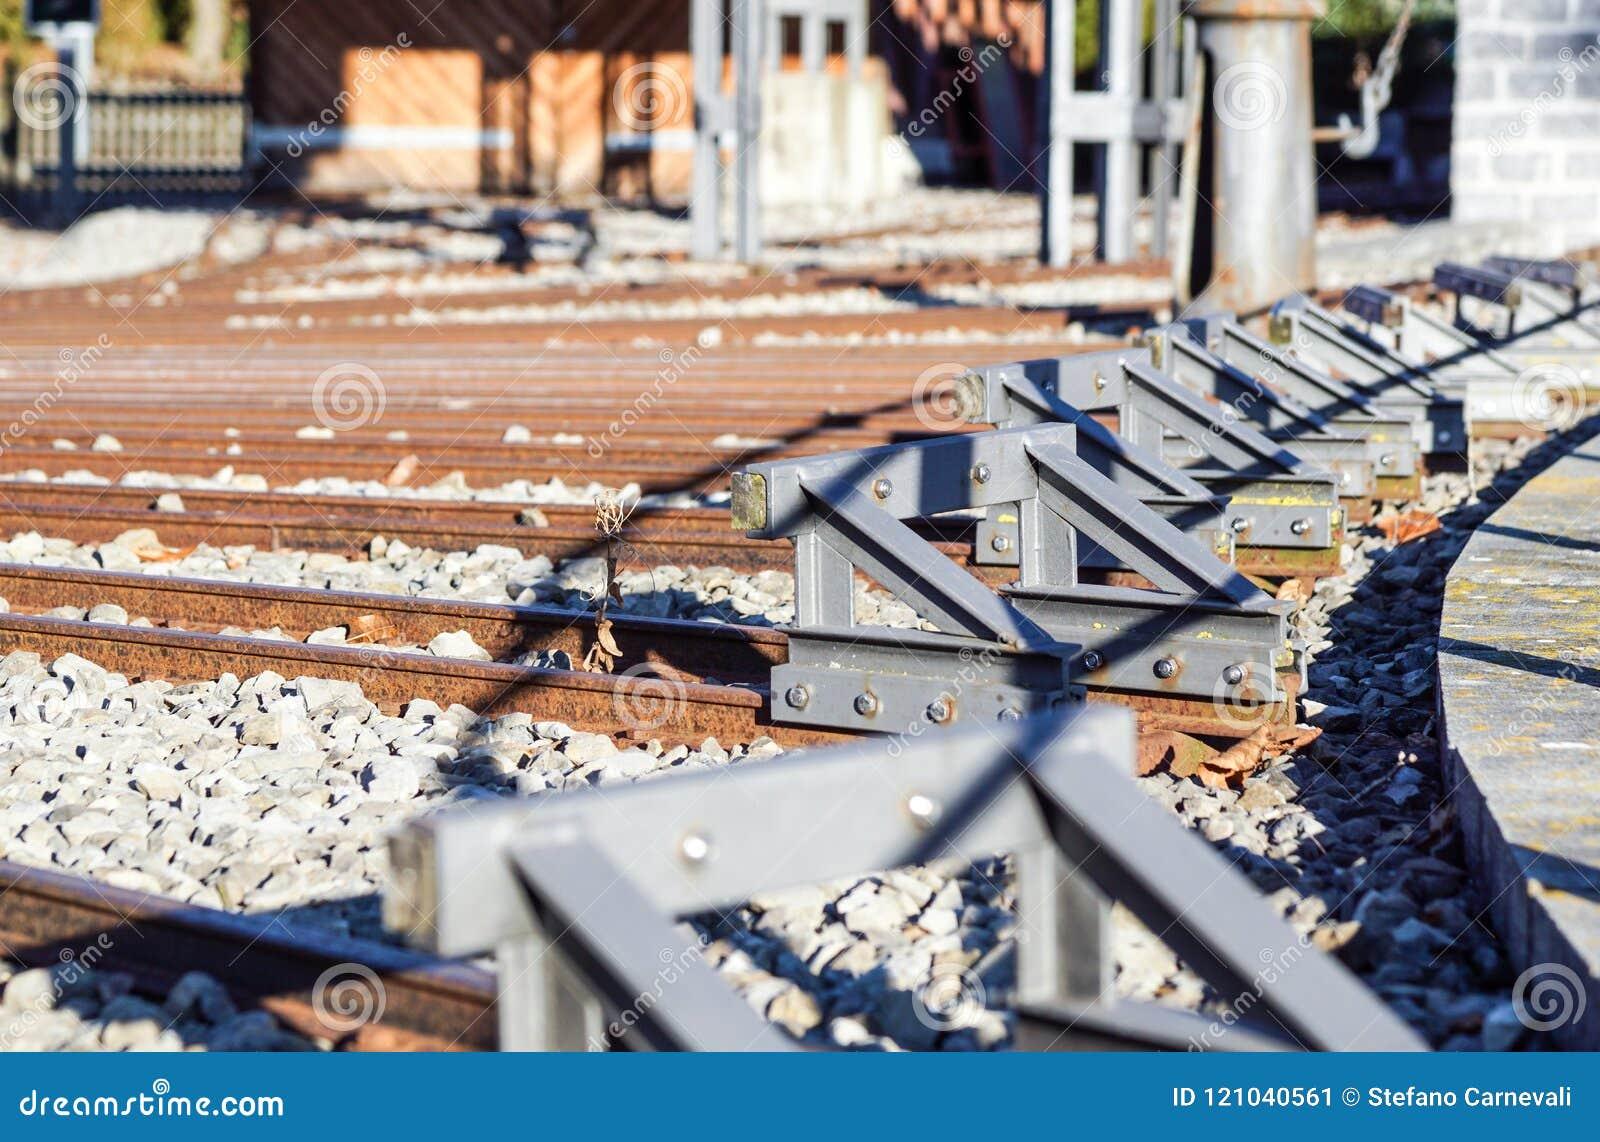 Buffer stop . ending rail tracks concept for limit, limitation restriction boundary, prohibited, end , border